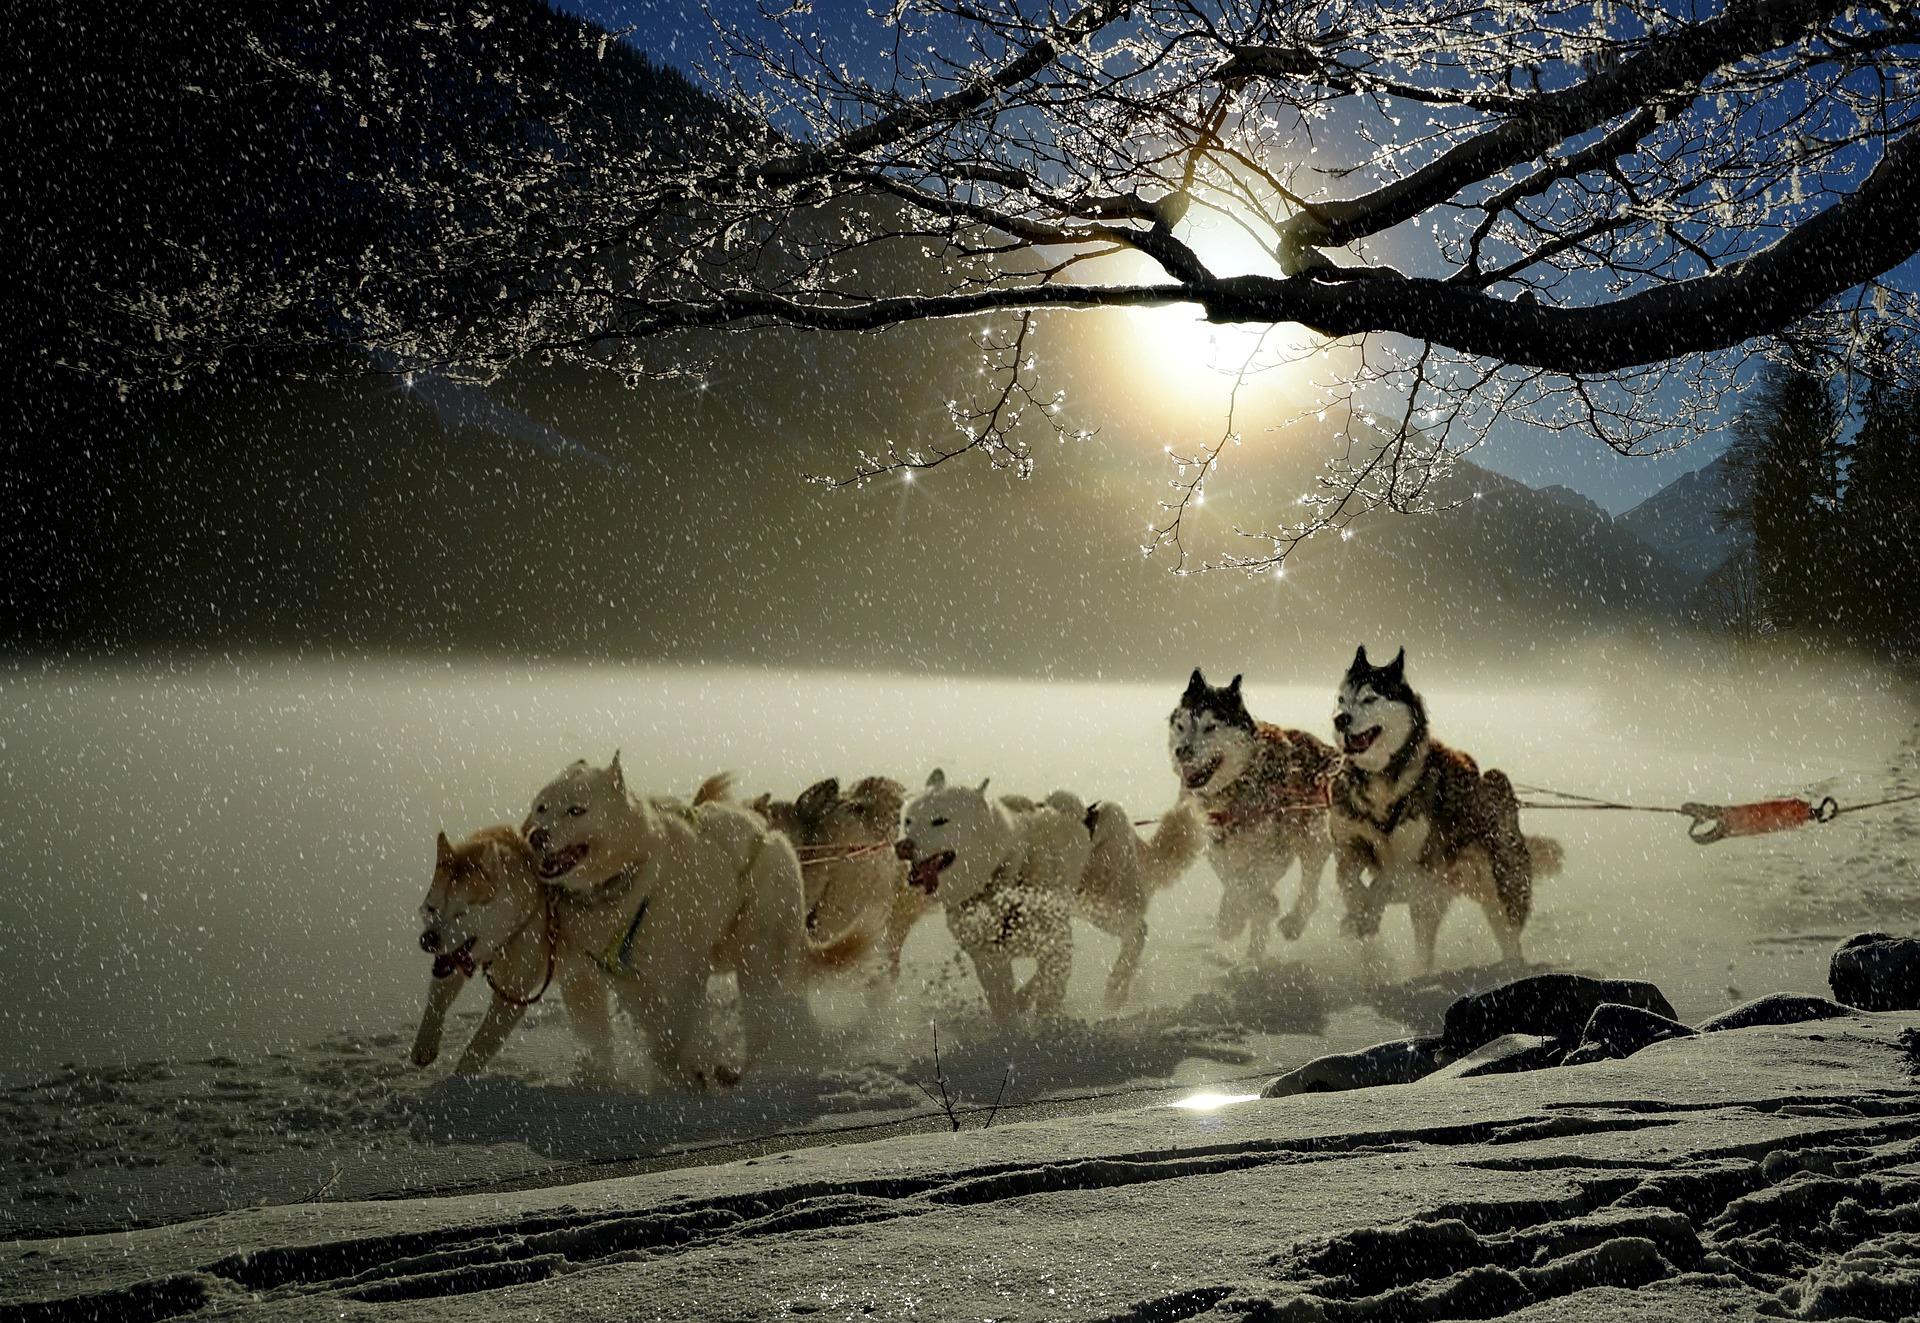 """ Dogs, Huskies, Animal, Dog Racing "" by  Anja  is  Public Domain ."